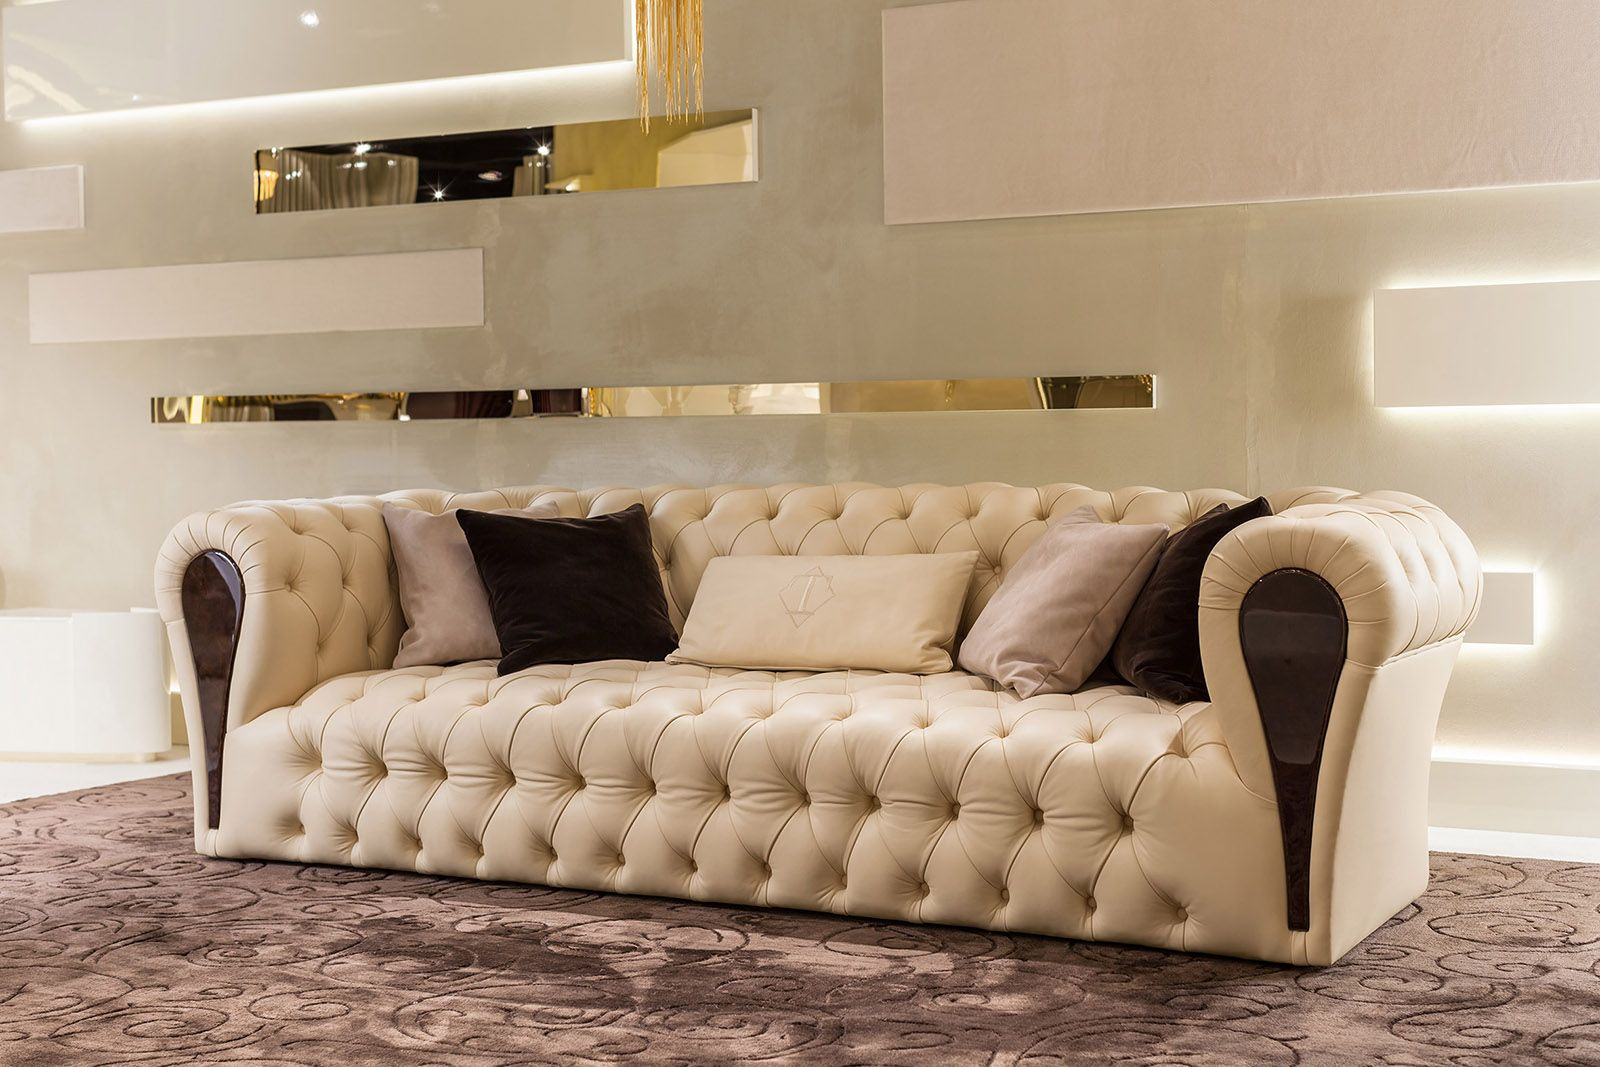 Italian Furniture For Exclusive And Modern Design Luxury Sofa Contemporary Sofa Design Sofa Design